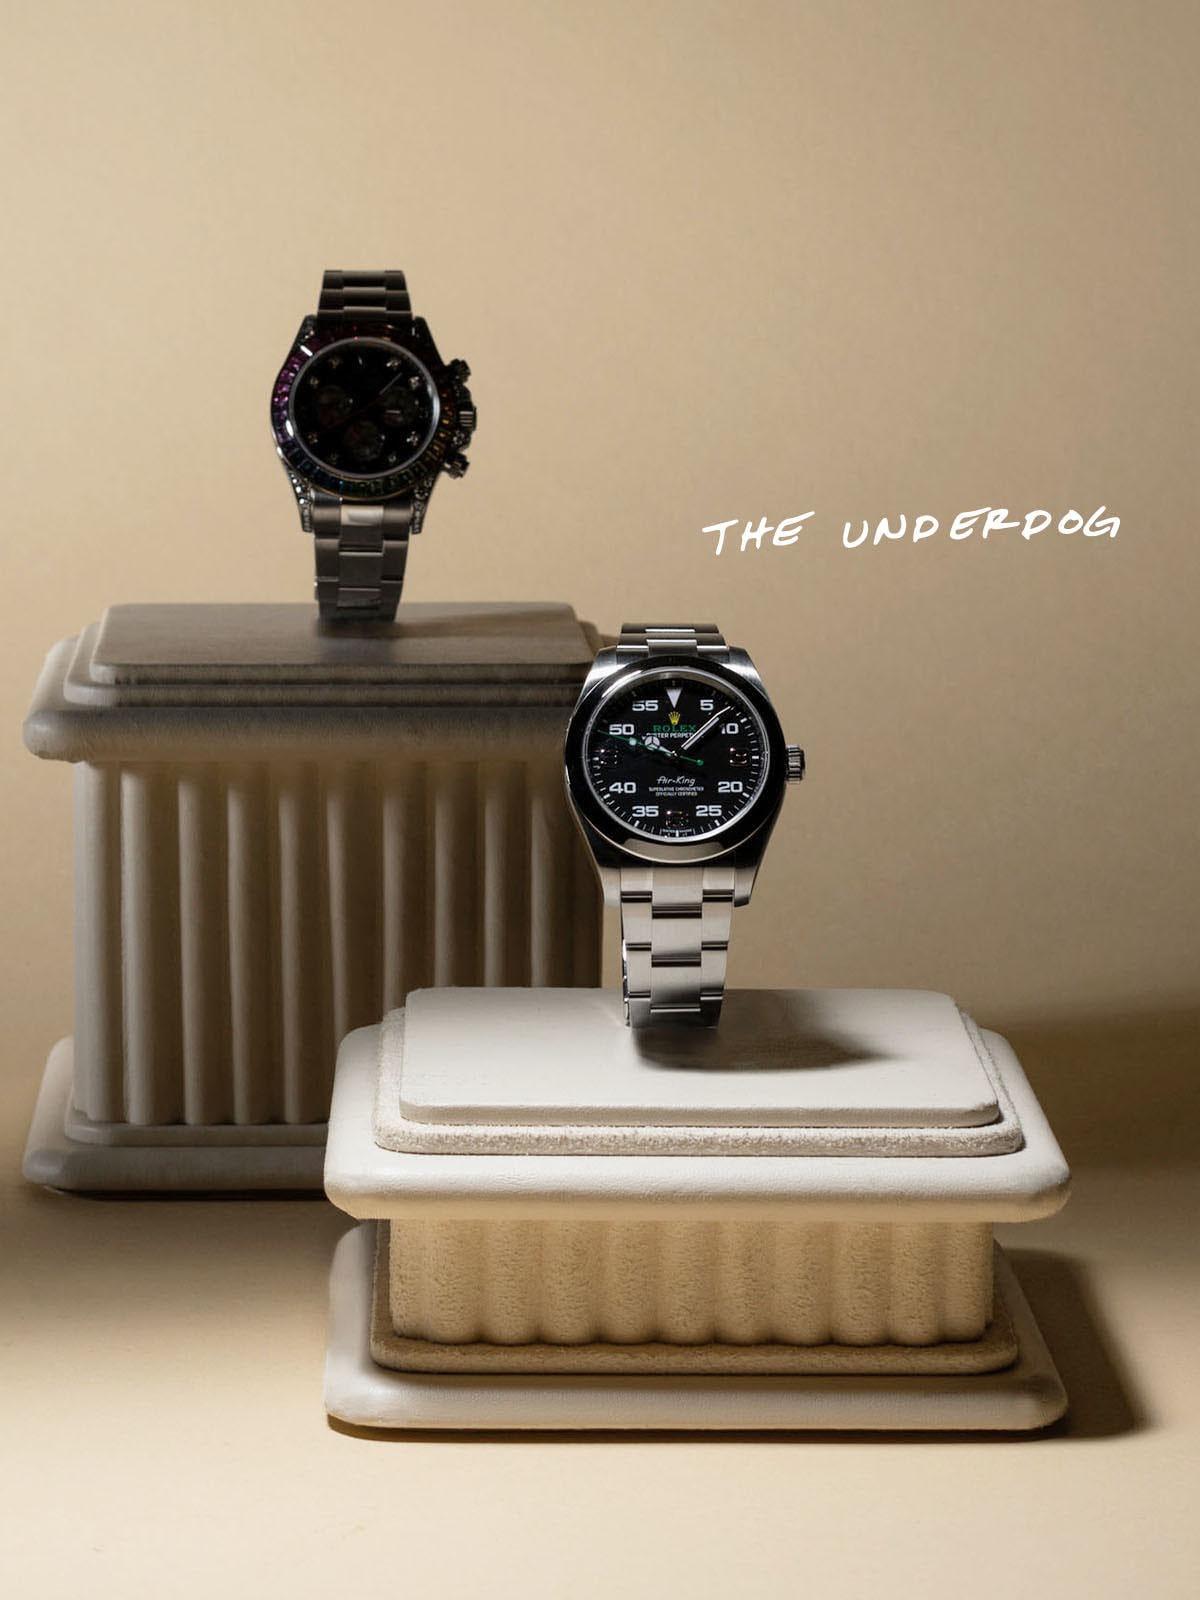 First Rolex Air-King - The Underdog